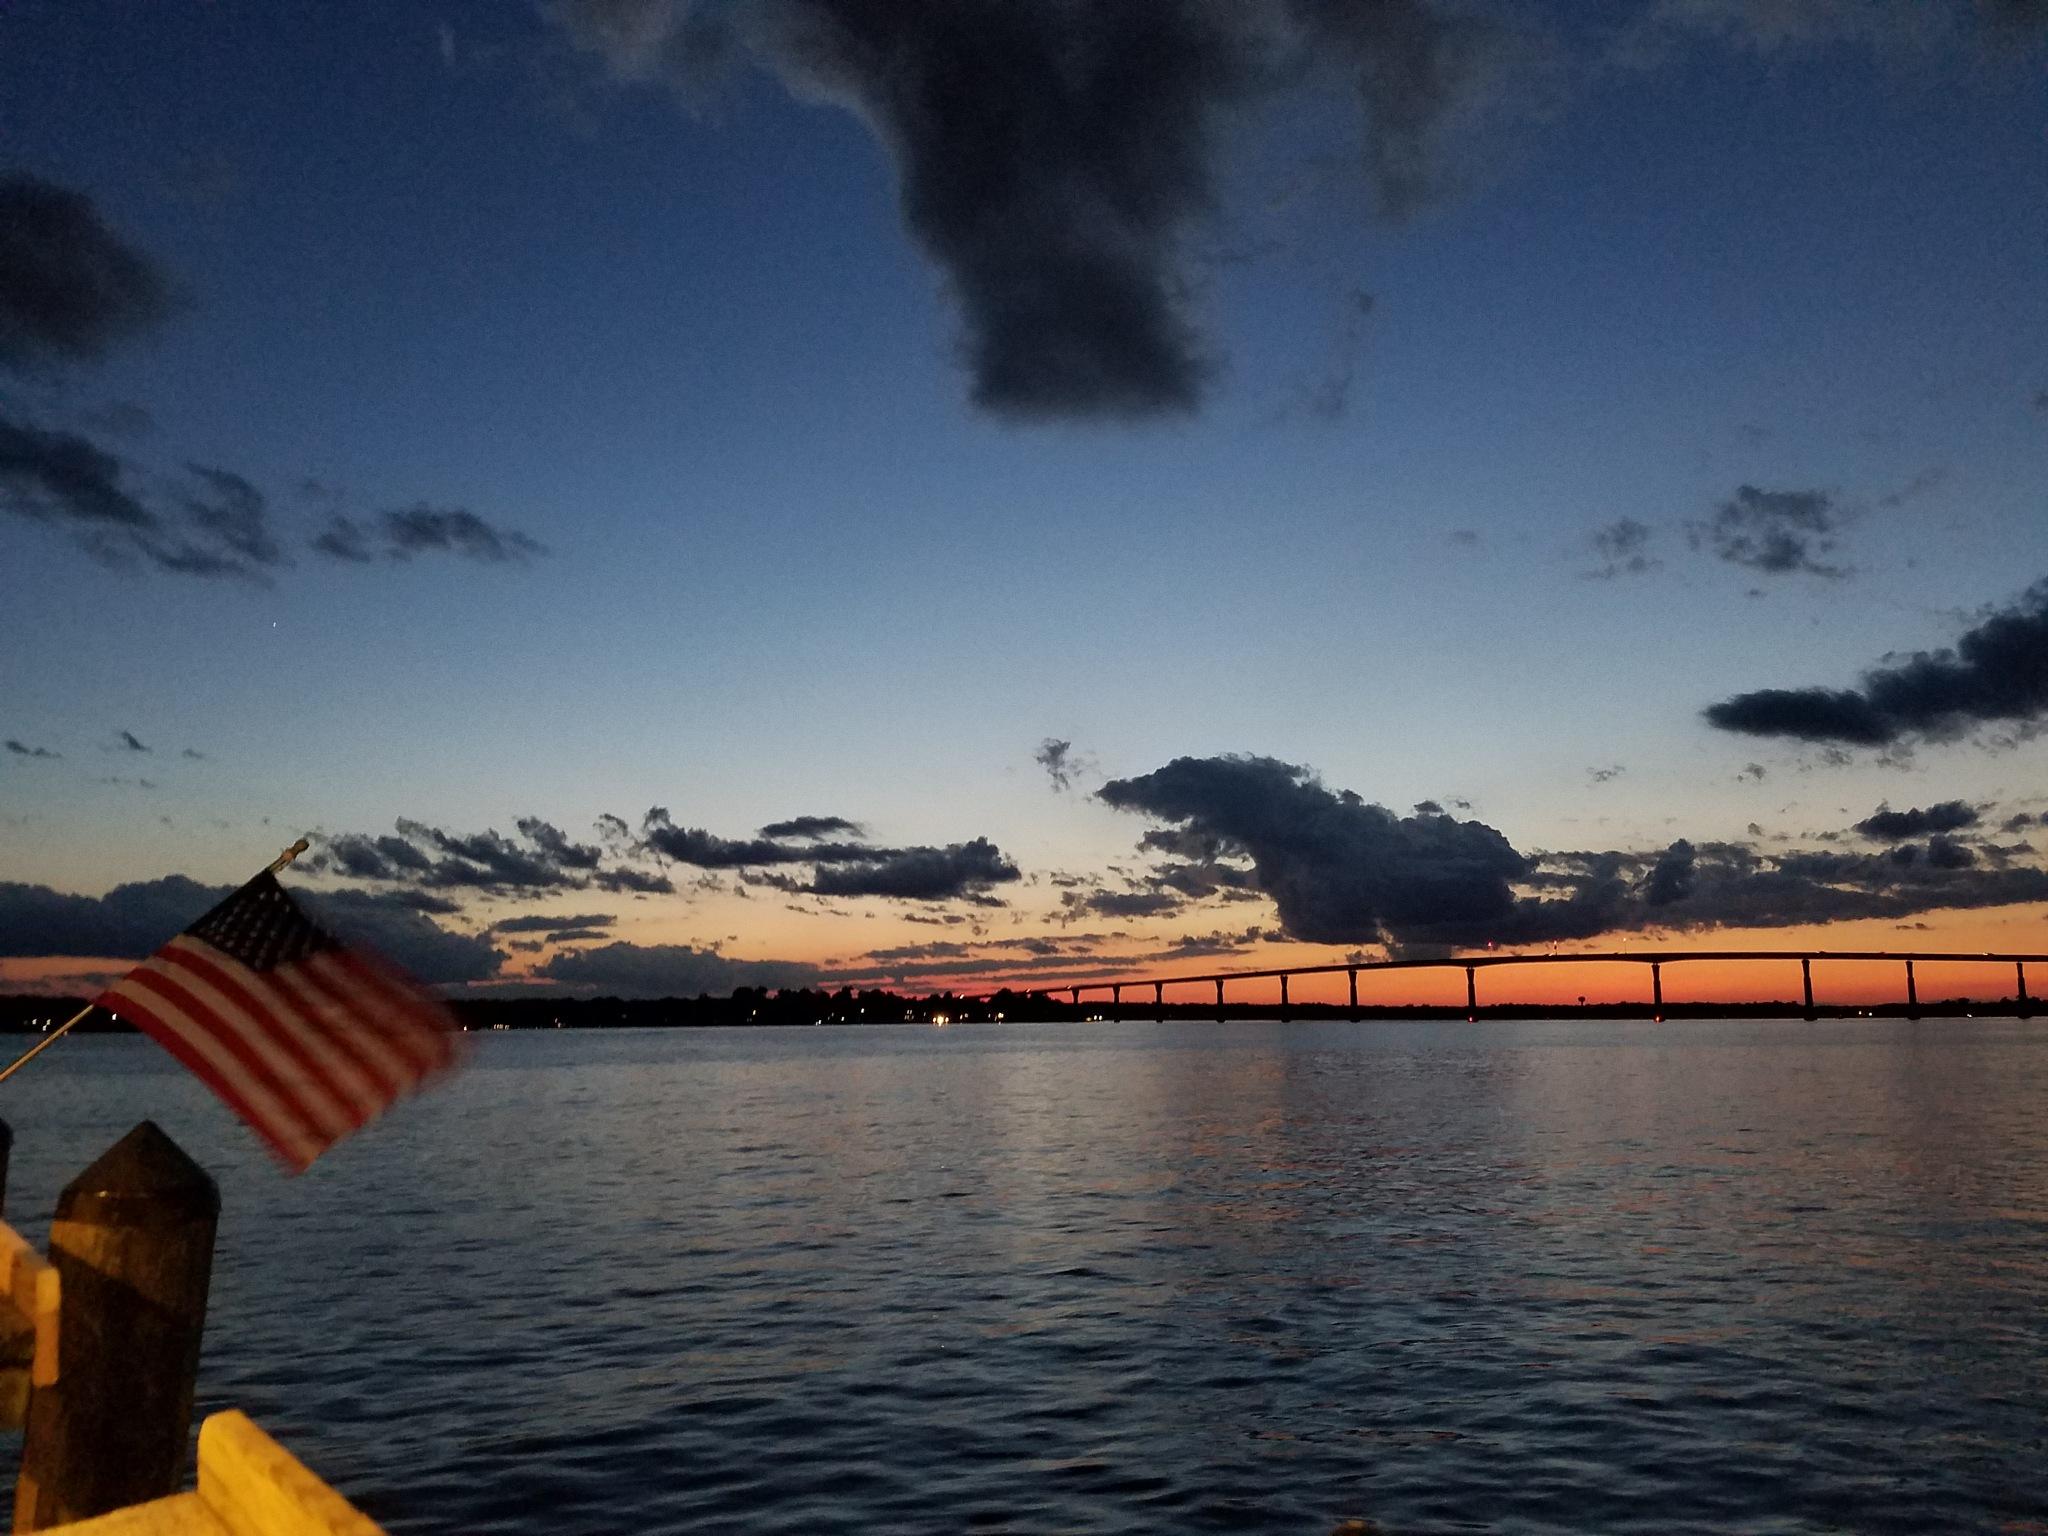 Sun below the horizon  by almablanca